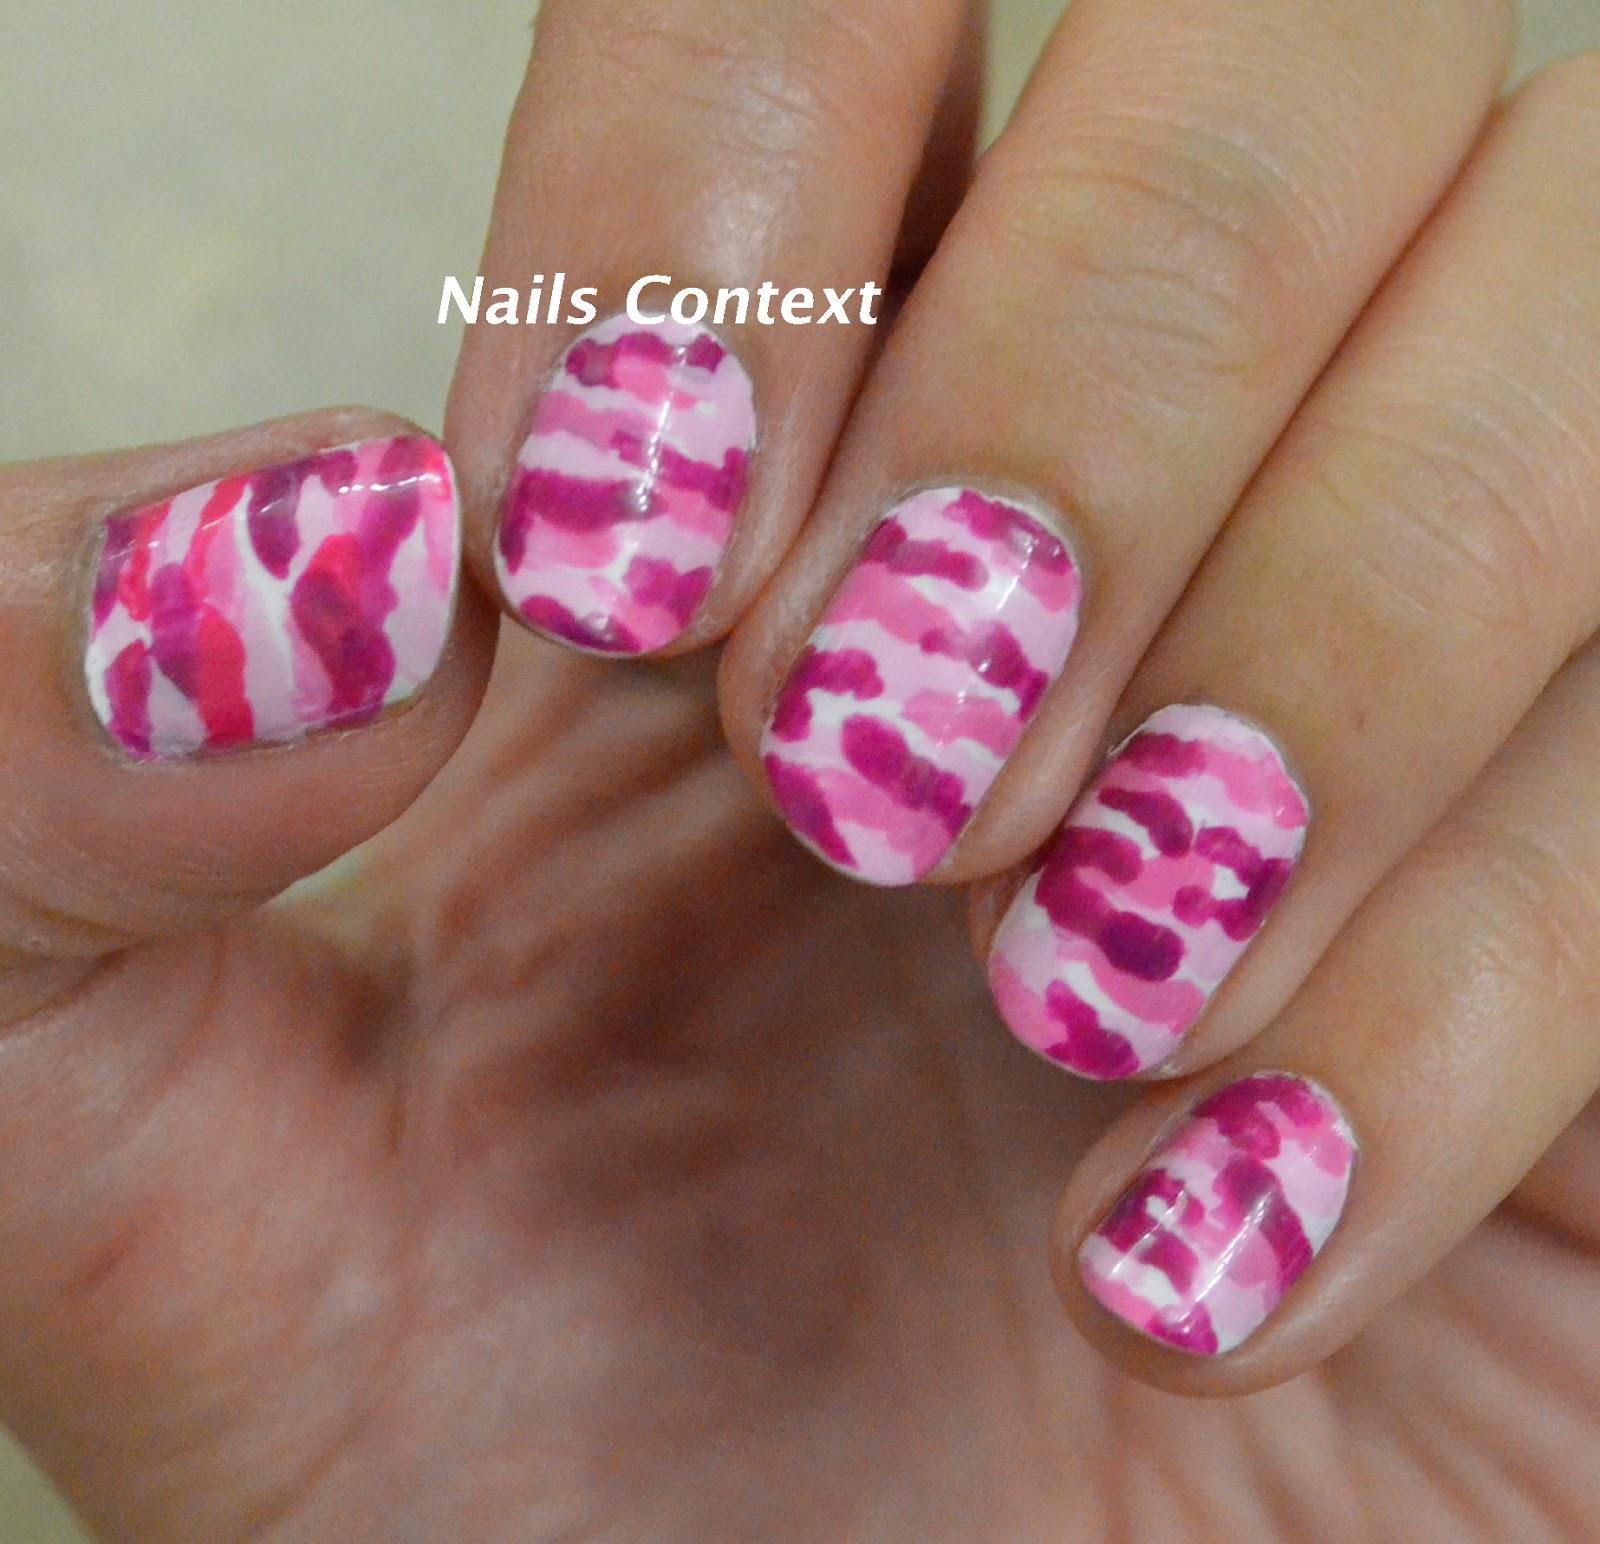 Nails Context Pink Camouflage Nails